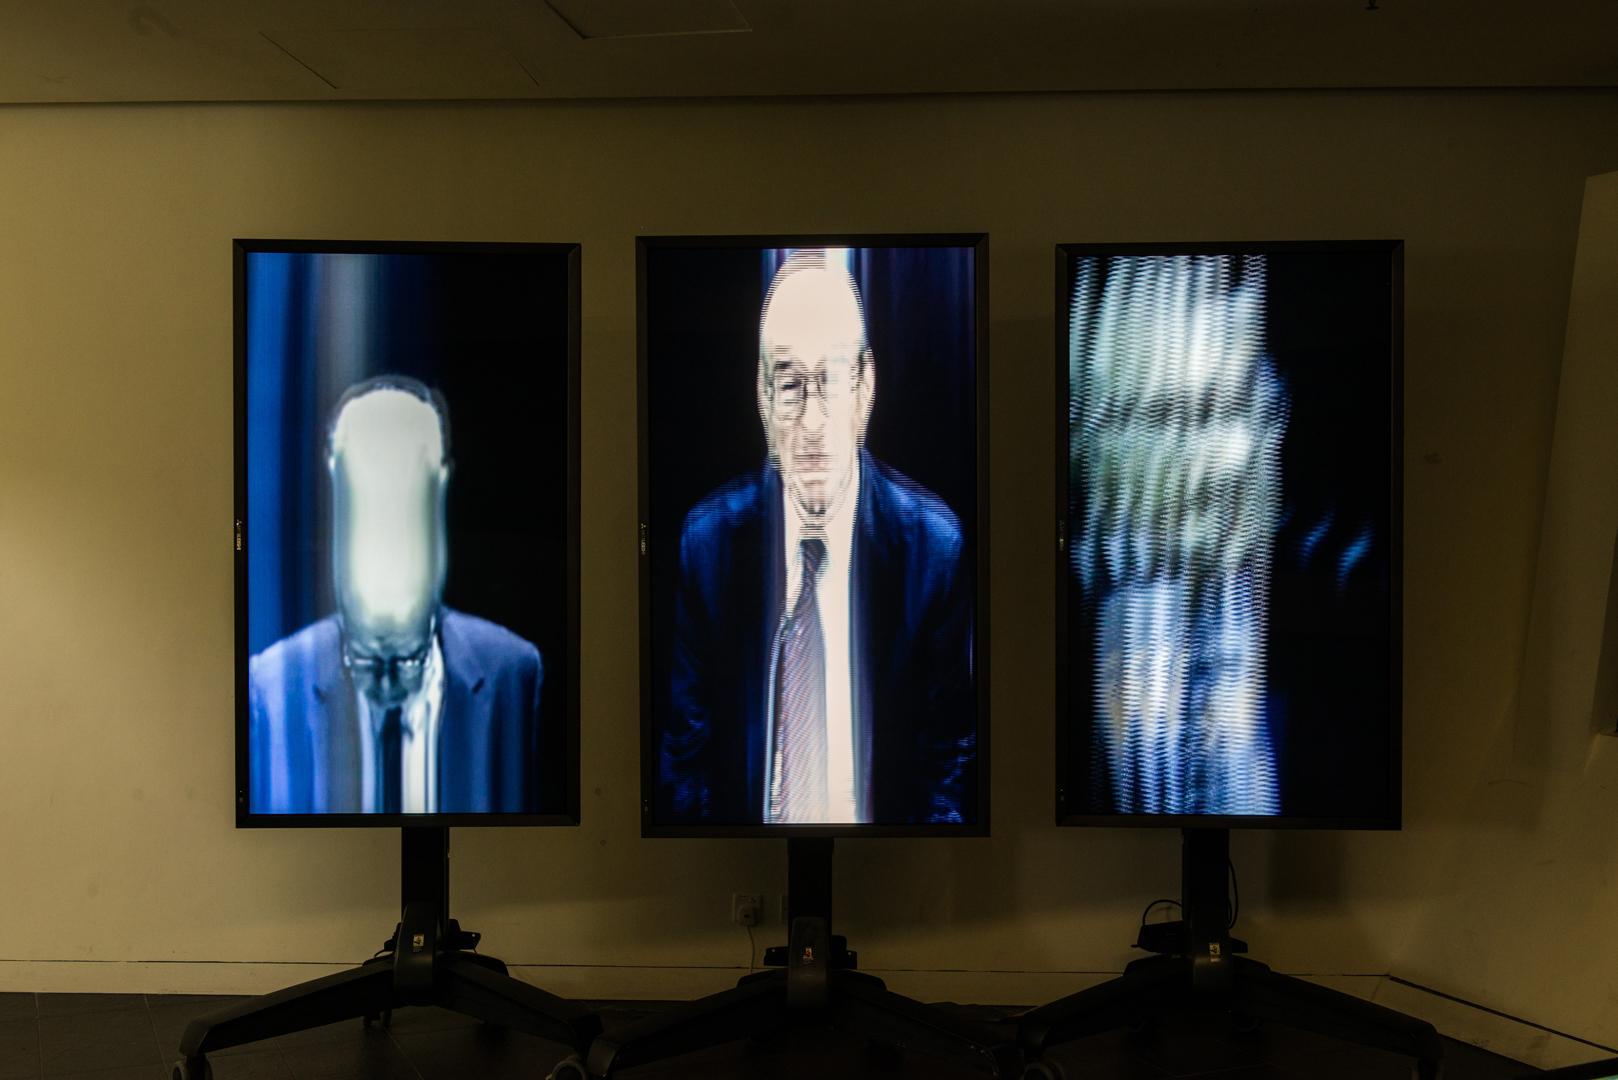 ©2015, Angela Ferraiolo, Three Bankers: Volcker, Greenspan, Friedman